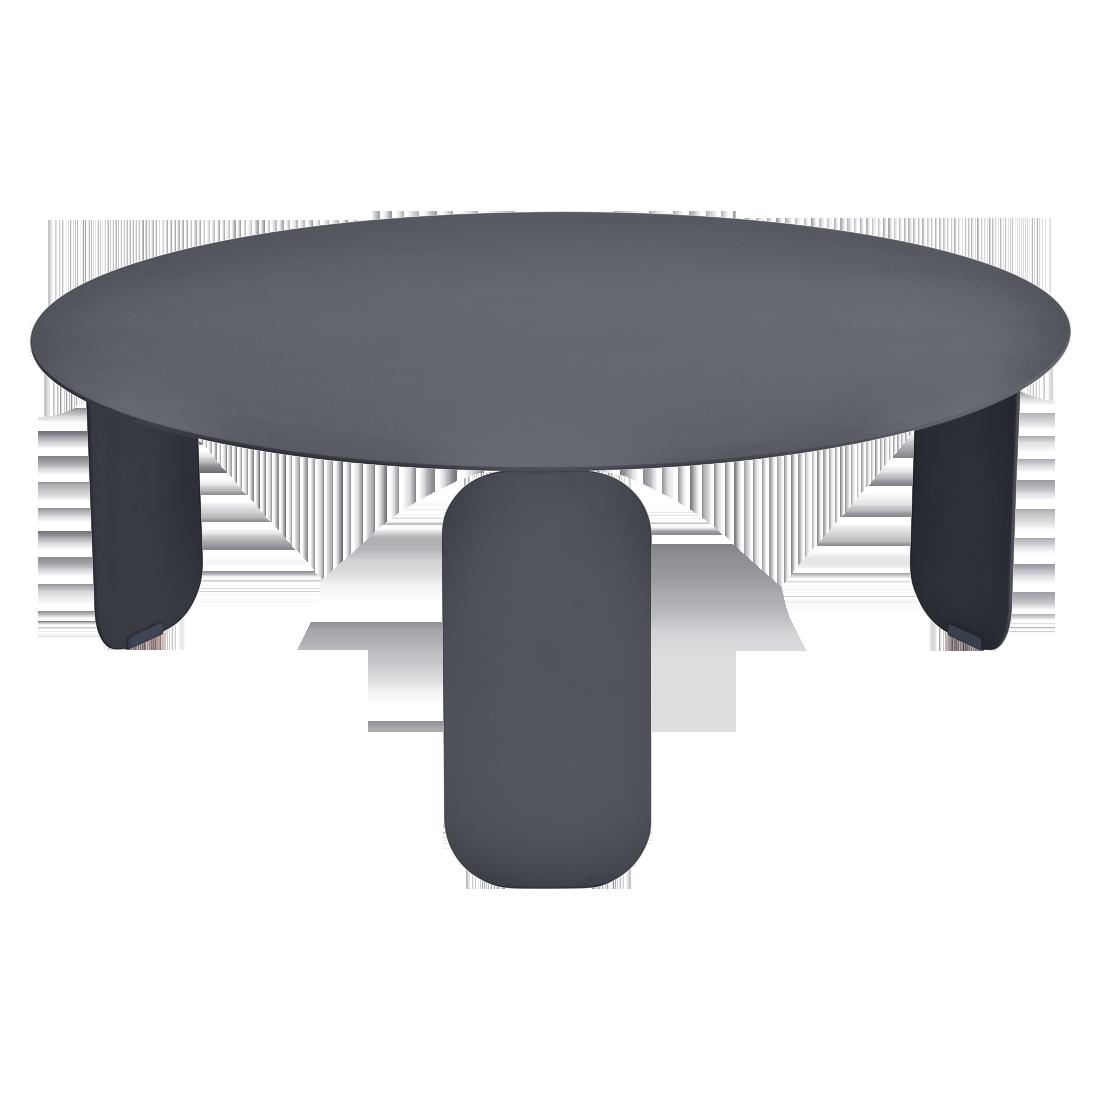 table basse metal, table basse design, table basse fermob, table basse noir